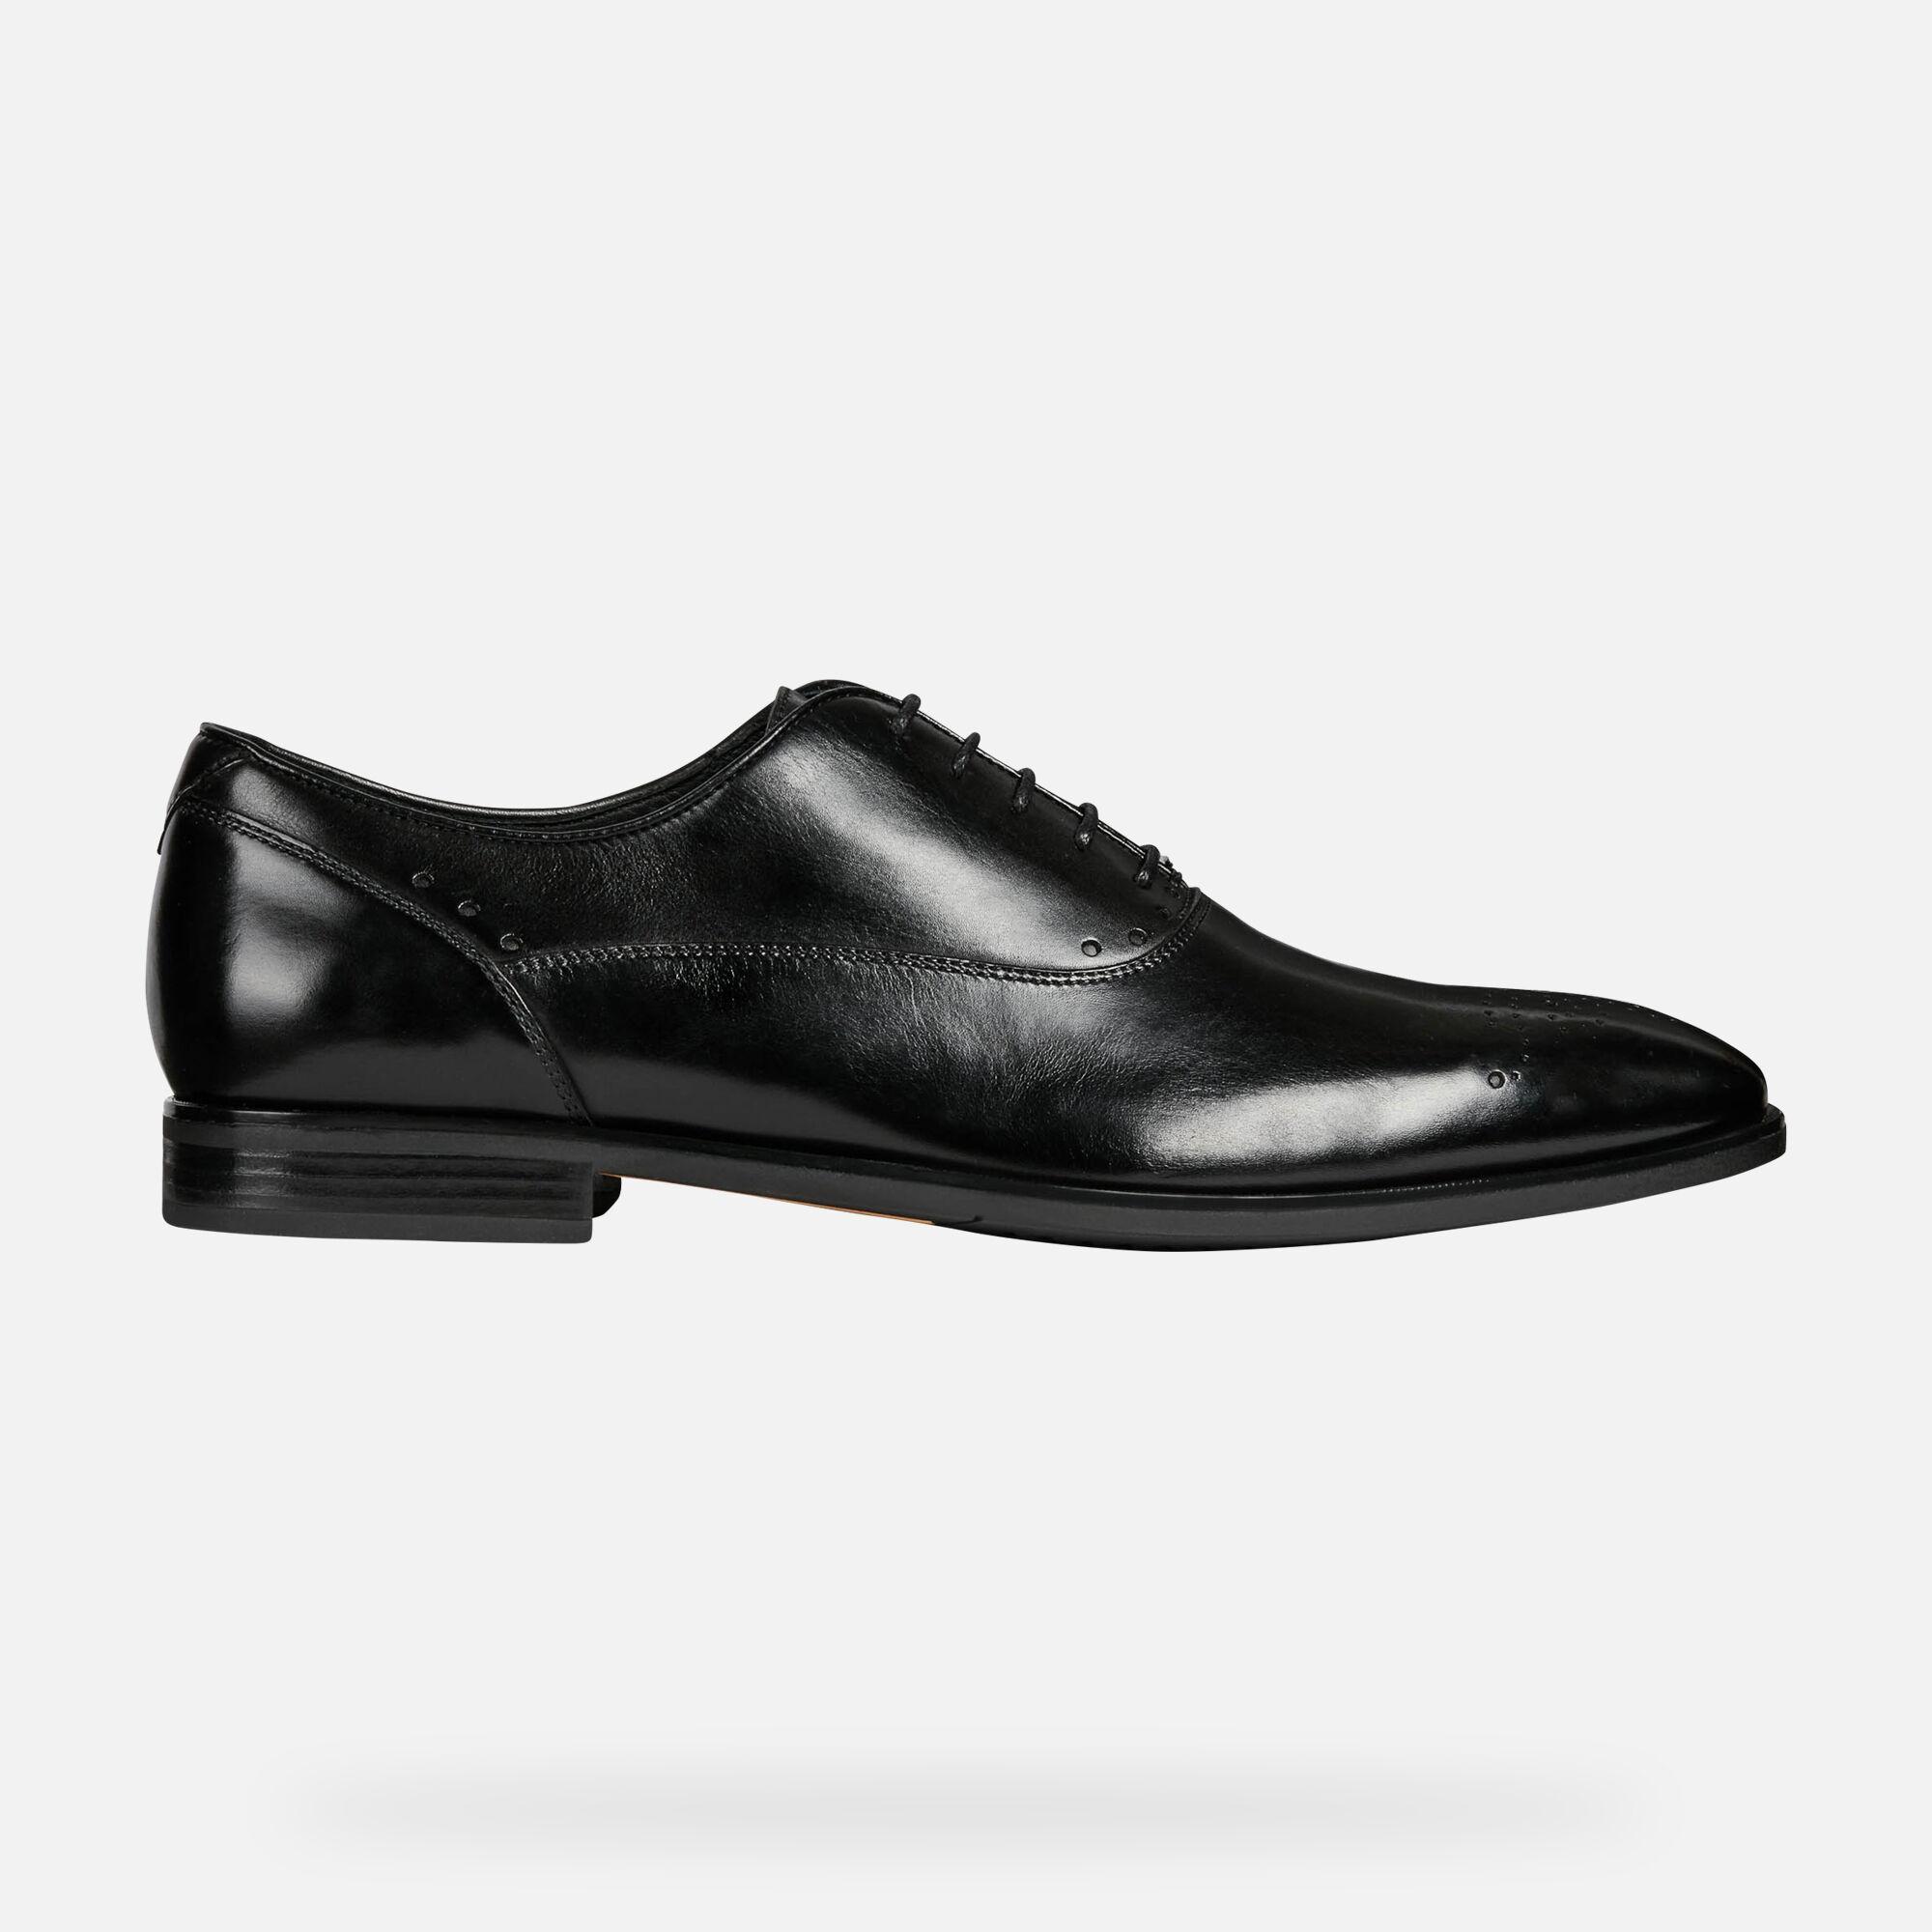 HommeGeox Chaussures New De Formelles Life UzMGqpVS